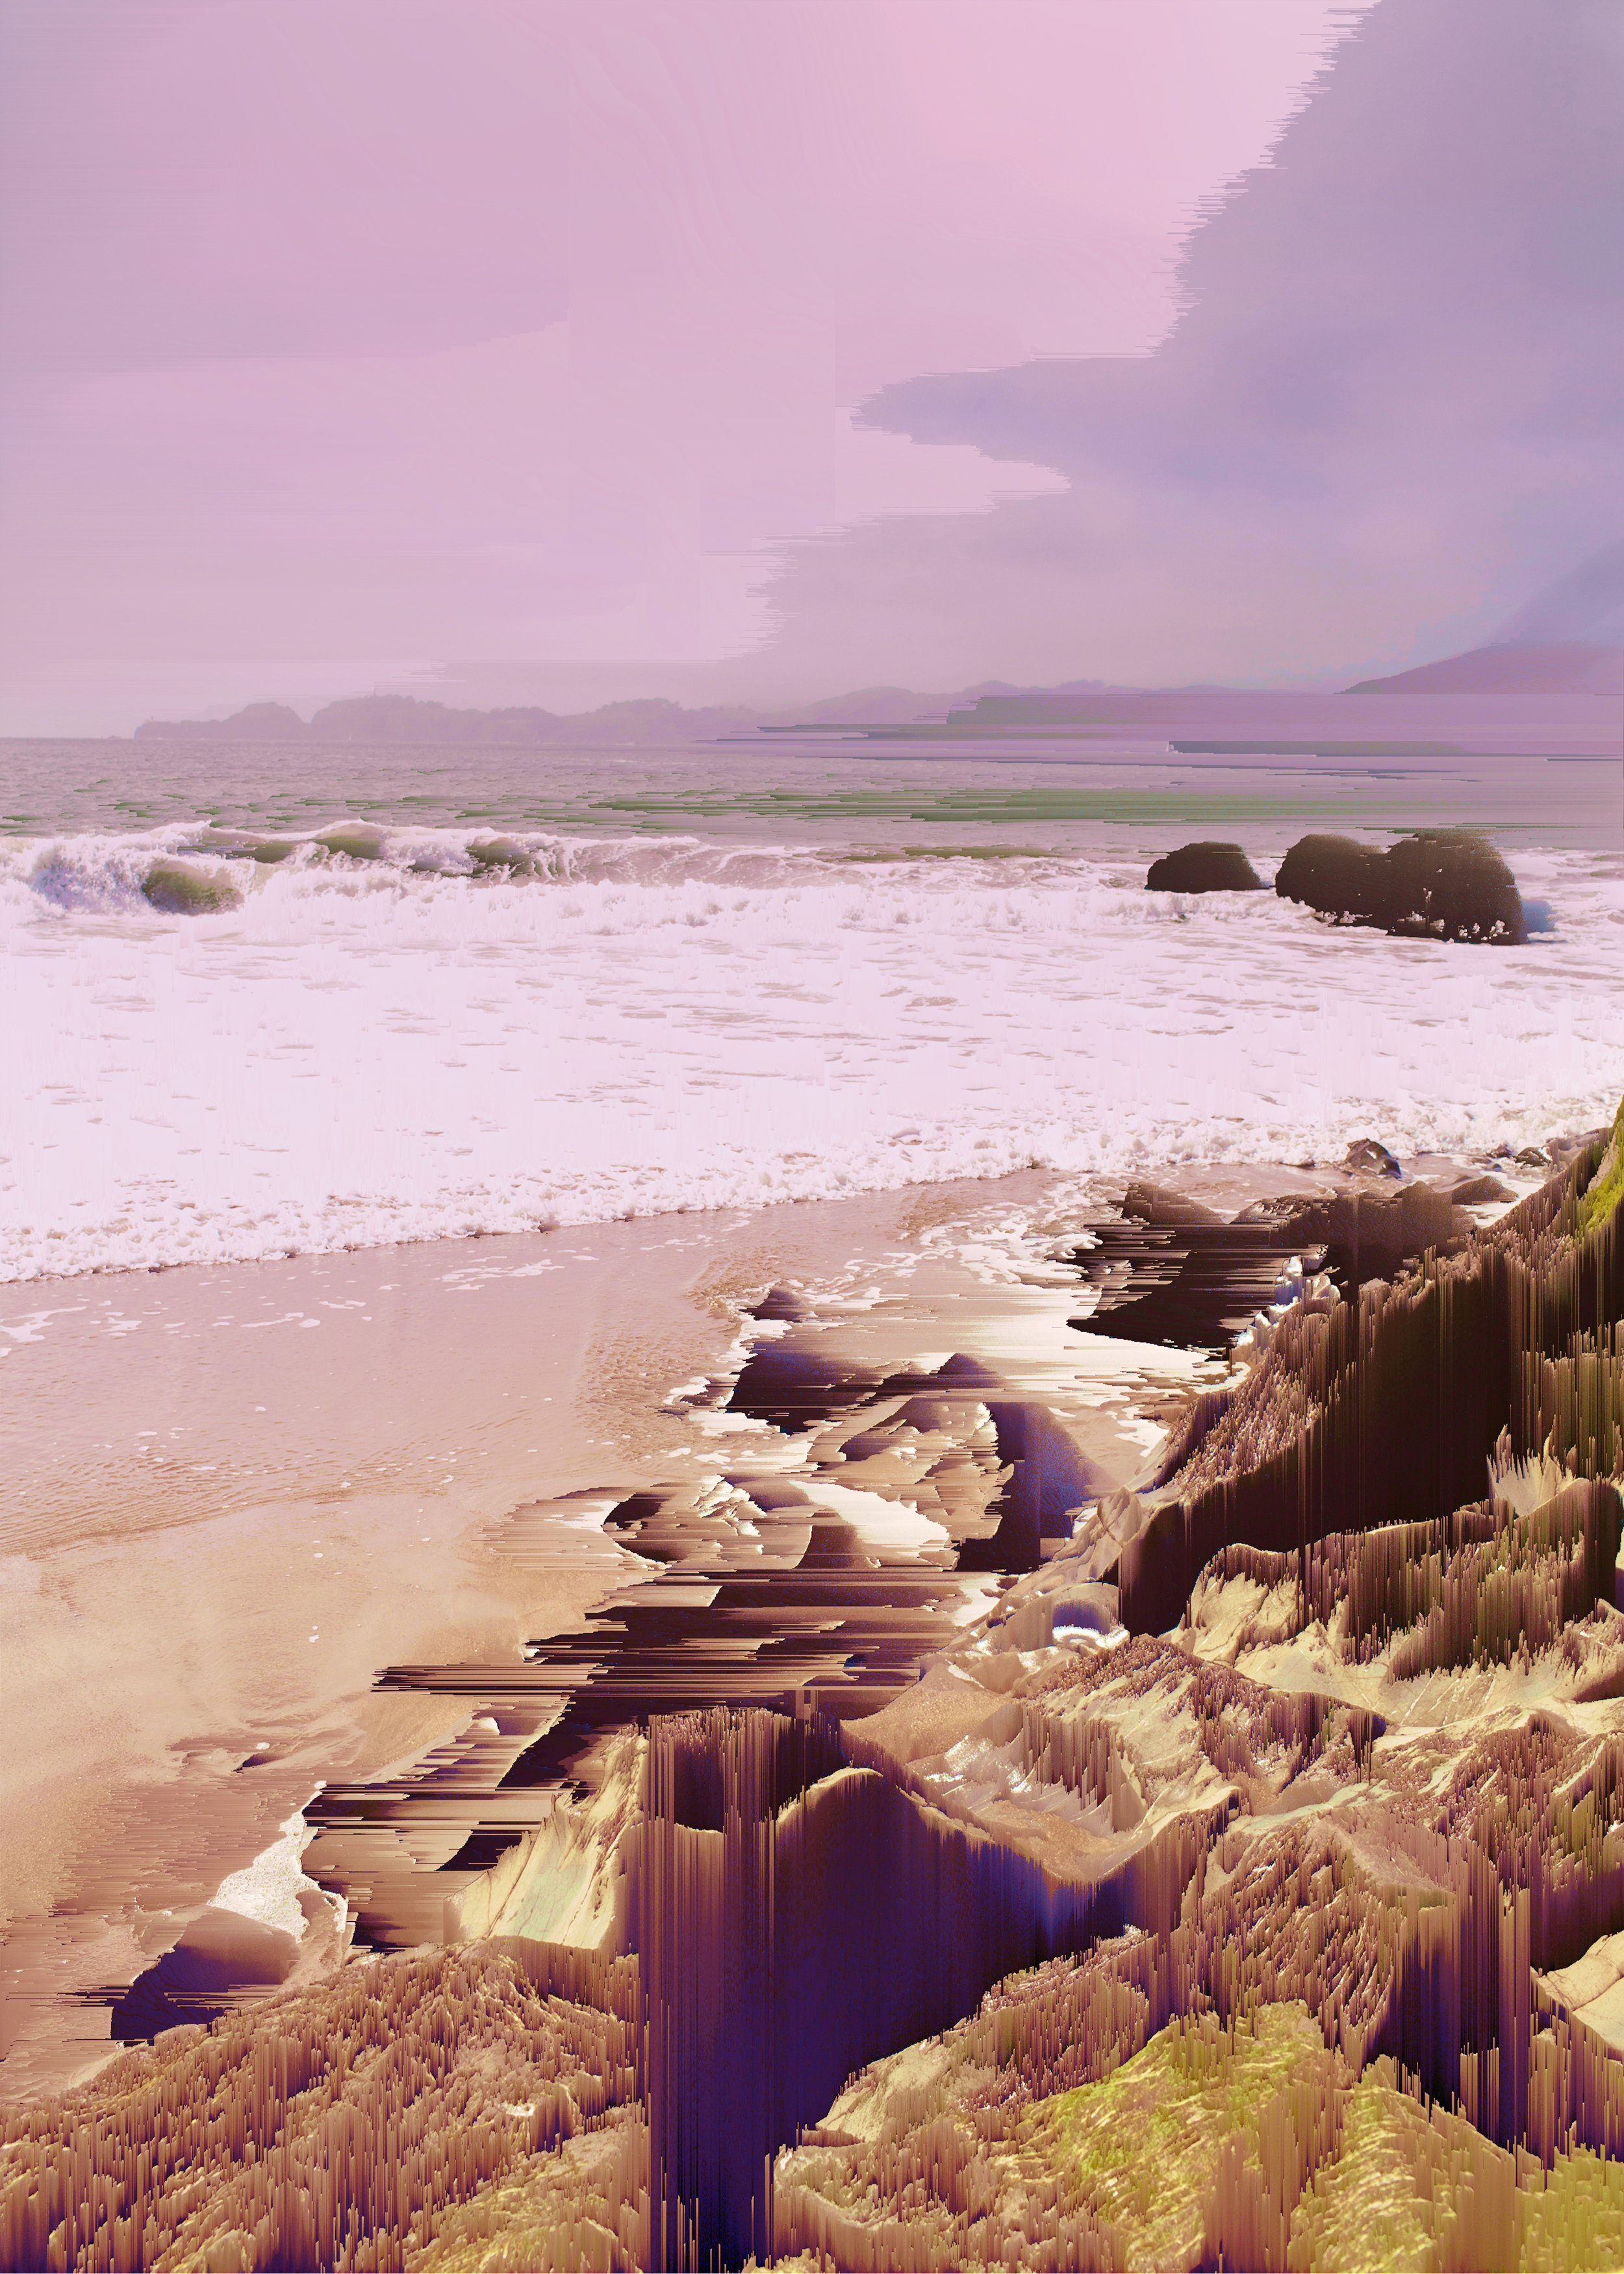 Ocean_001 glitch_color_edit.jpg